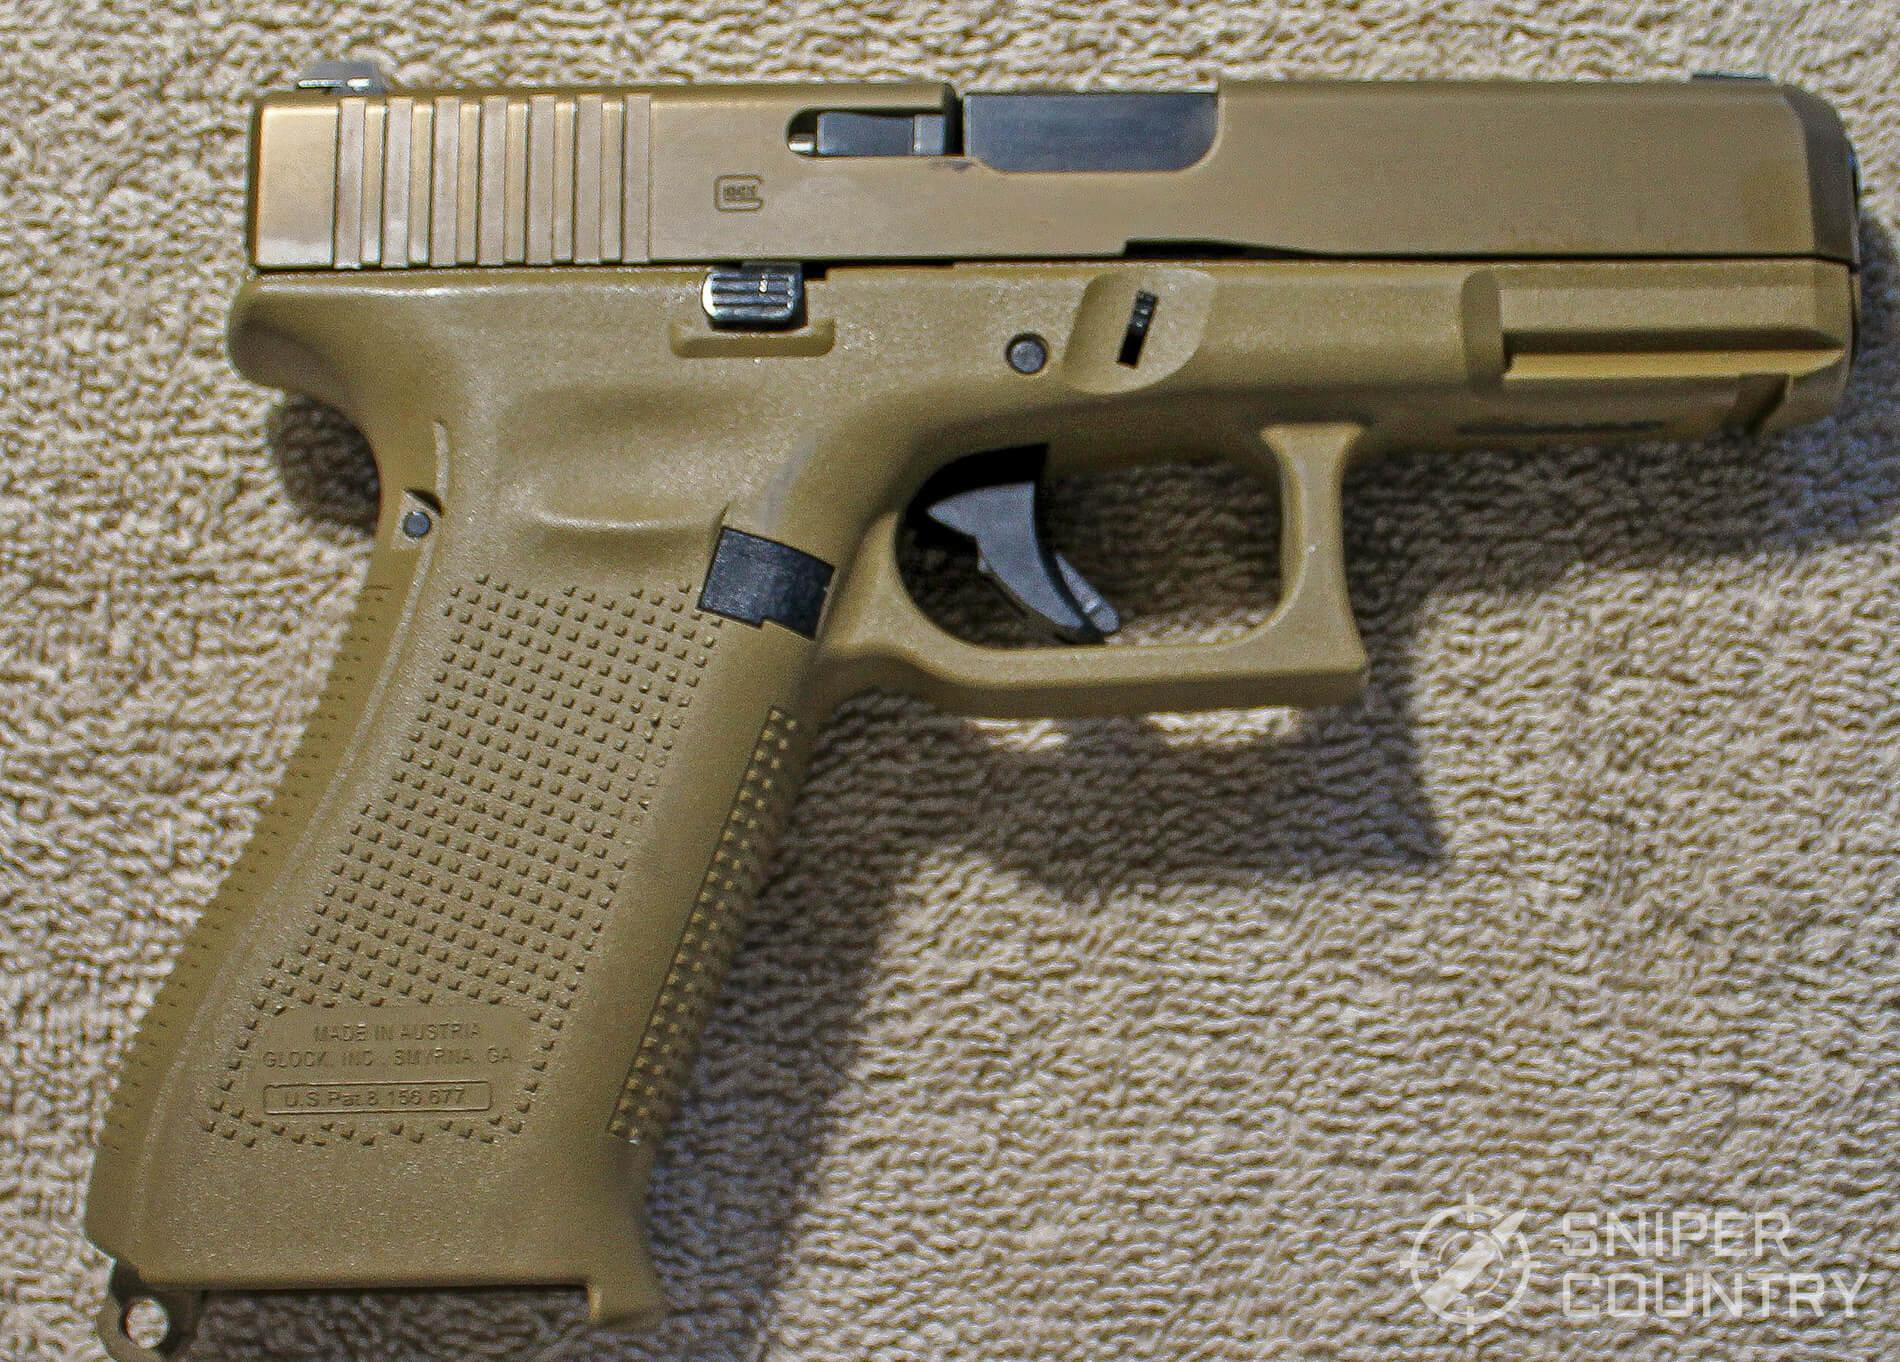 Glock G19X right side